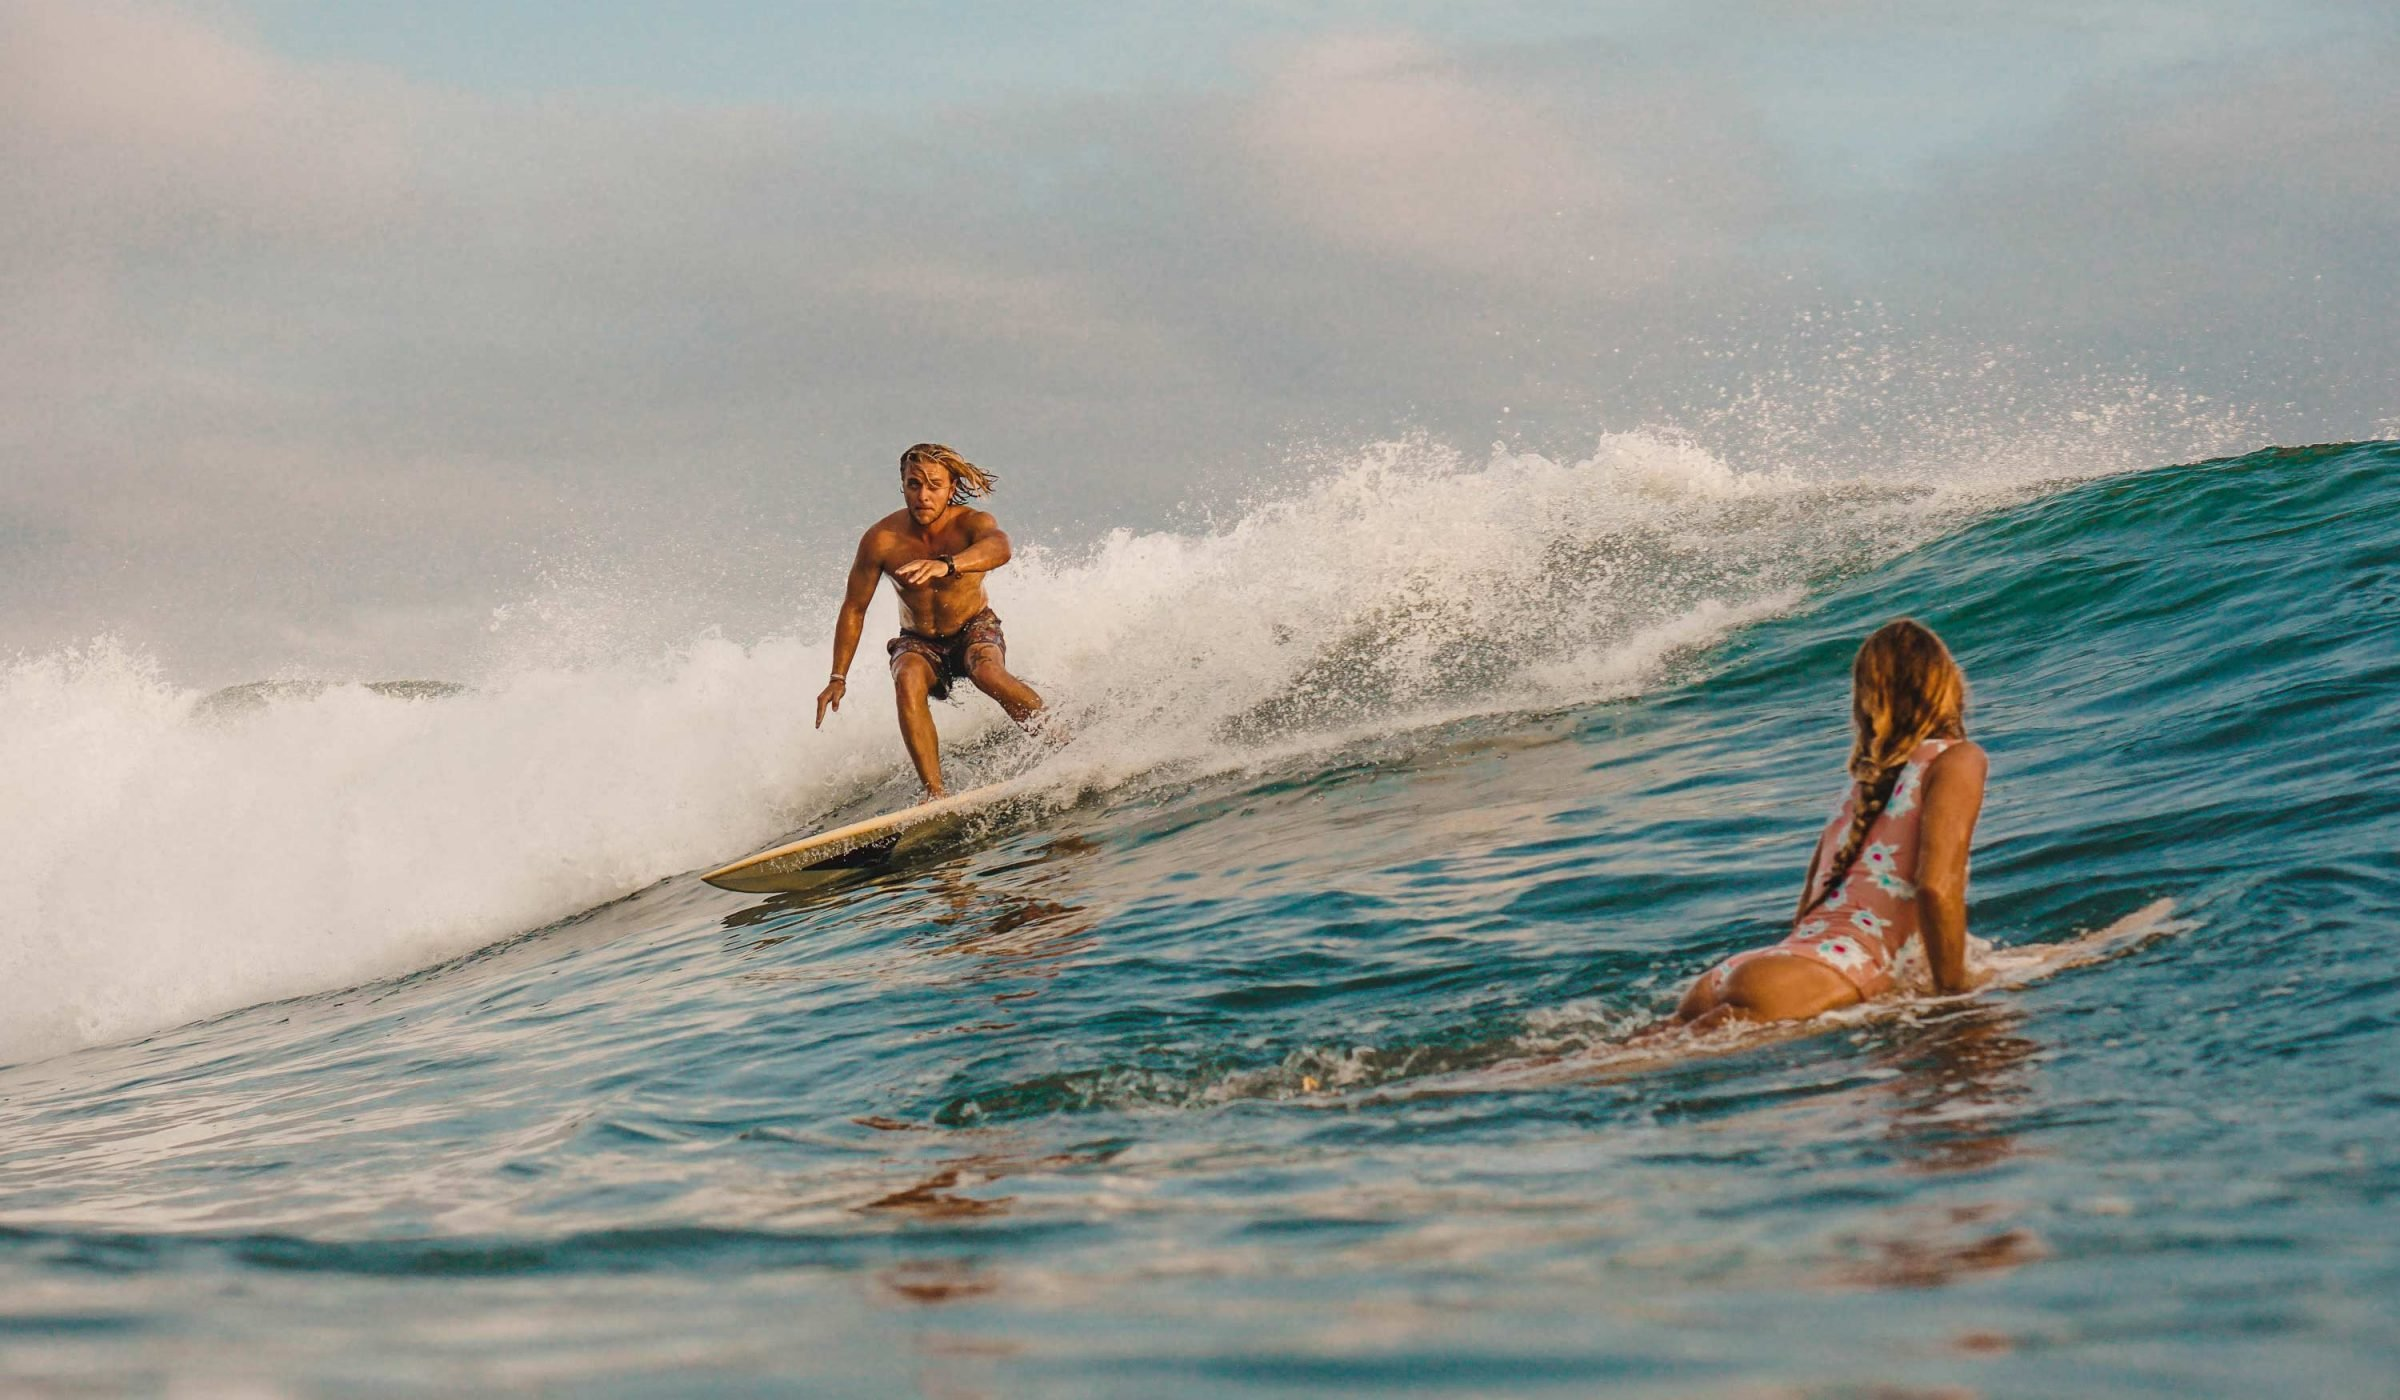 Nosara Francois Hache Costa Rica Waves